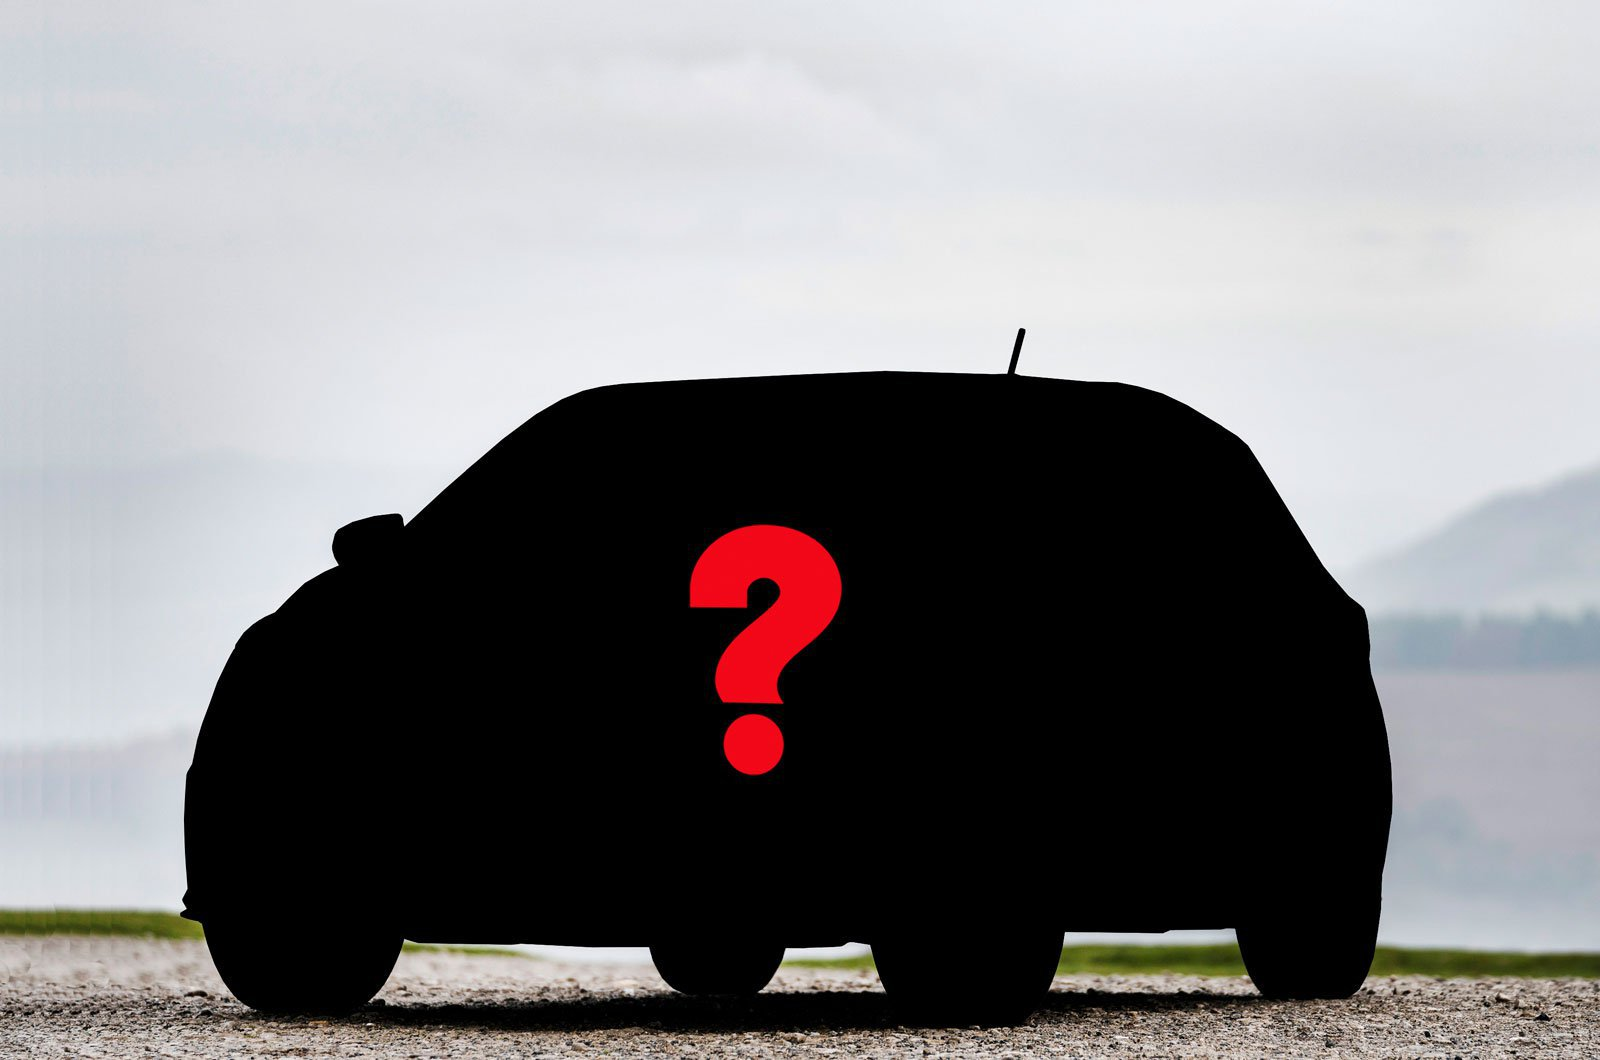 Small car silhouette